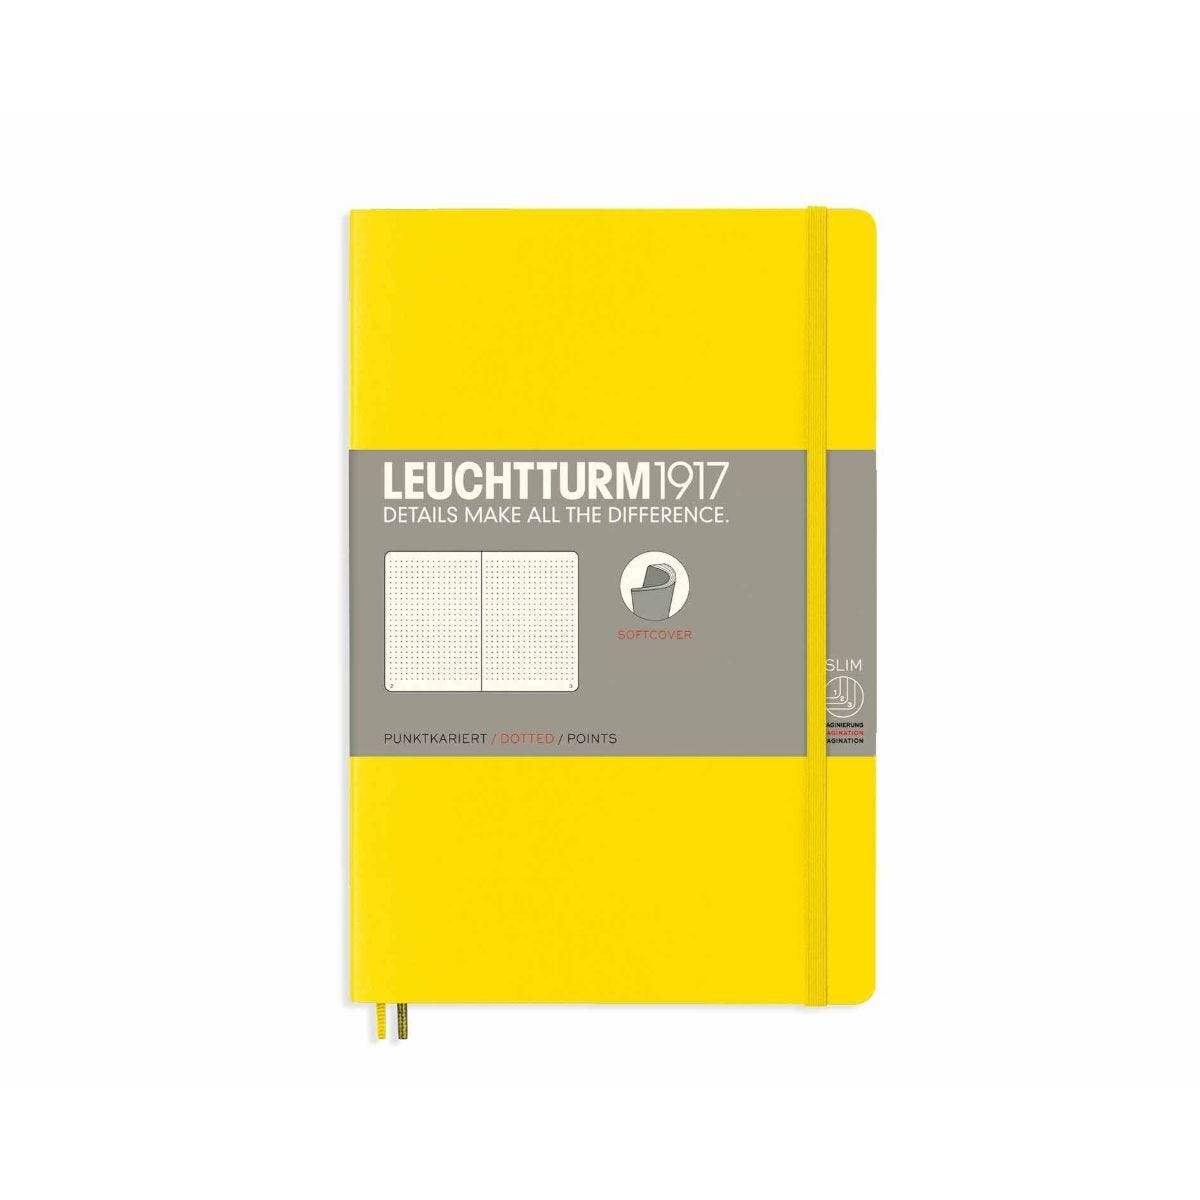 Leuchtturm1917 Soft Cover Notebook Dotted B6 Plus